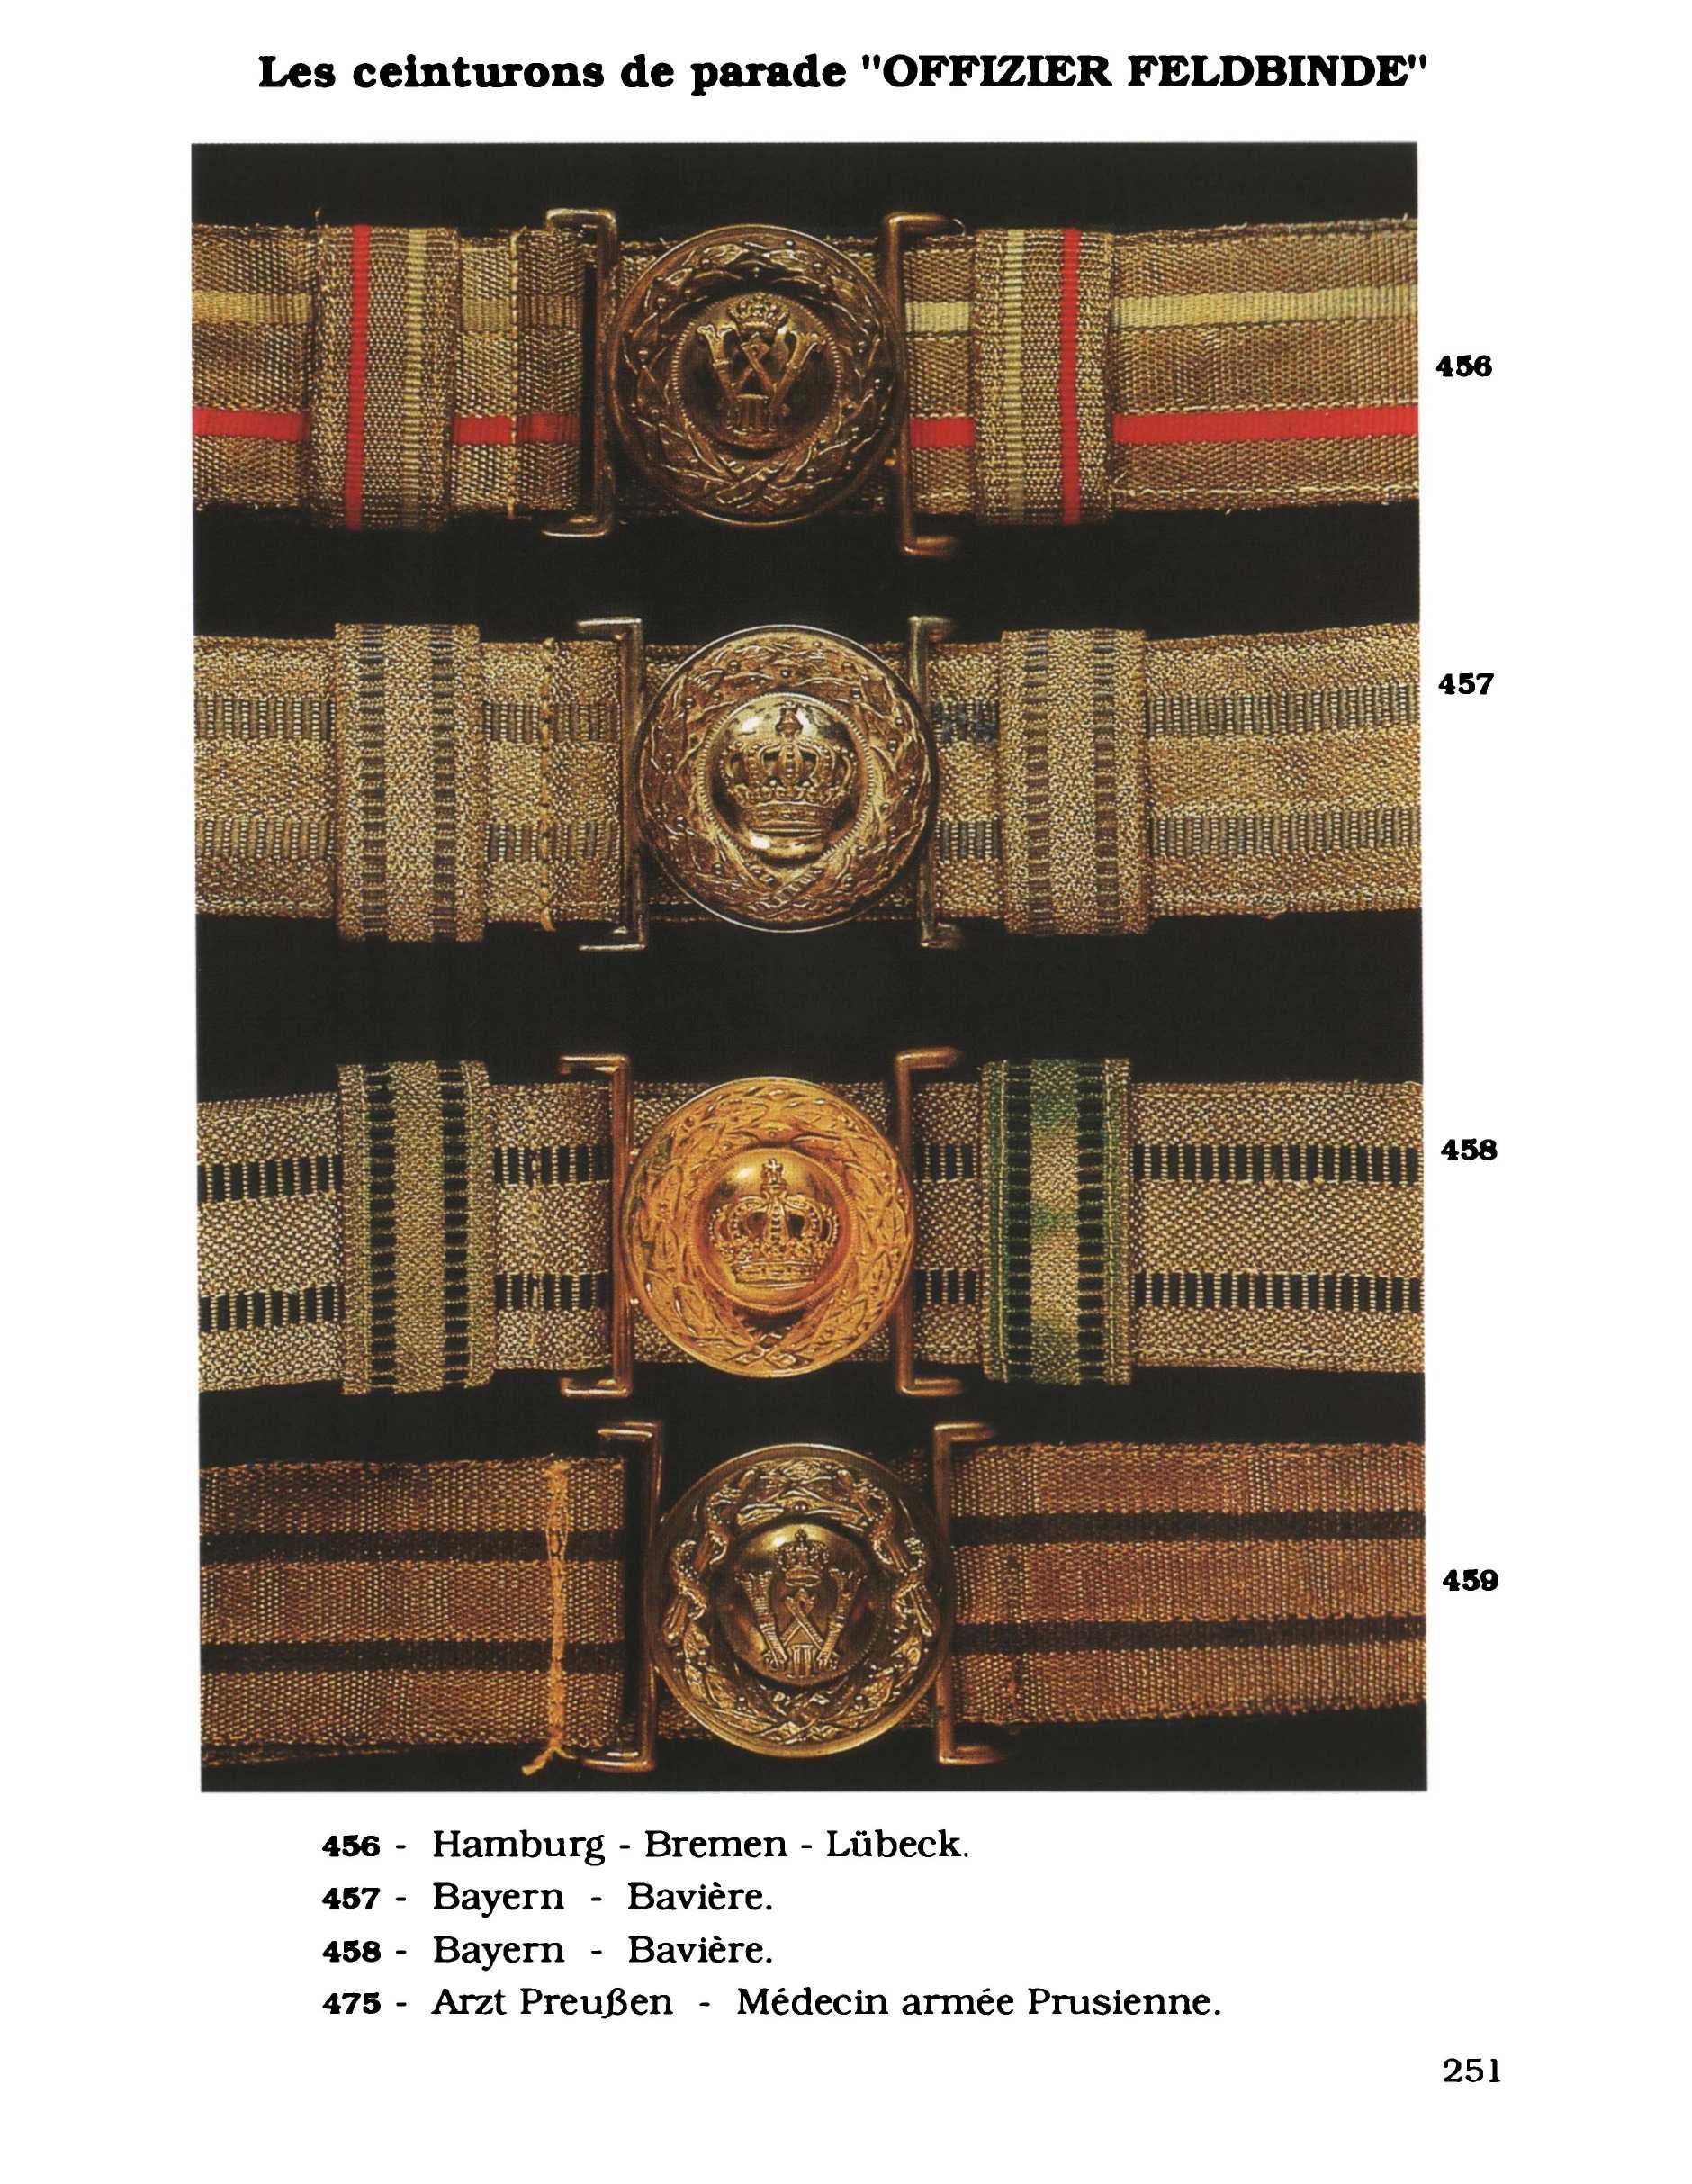 CatellaF.-GottmitUnsLesbouclesdeceintureAllemandes1870-1945.1991.PDFHQ_0253.jpg